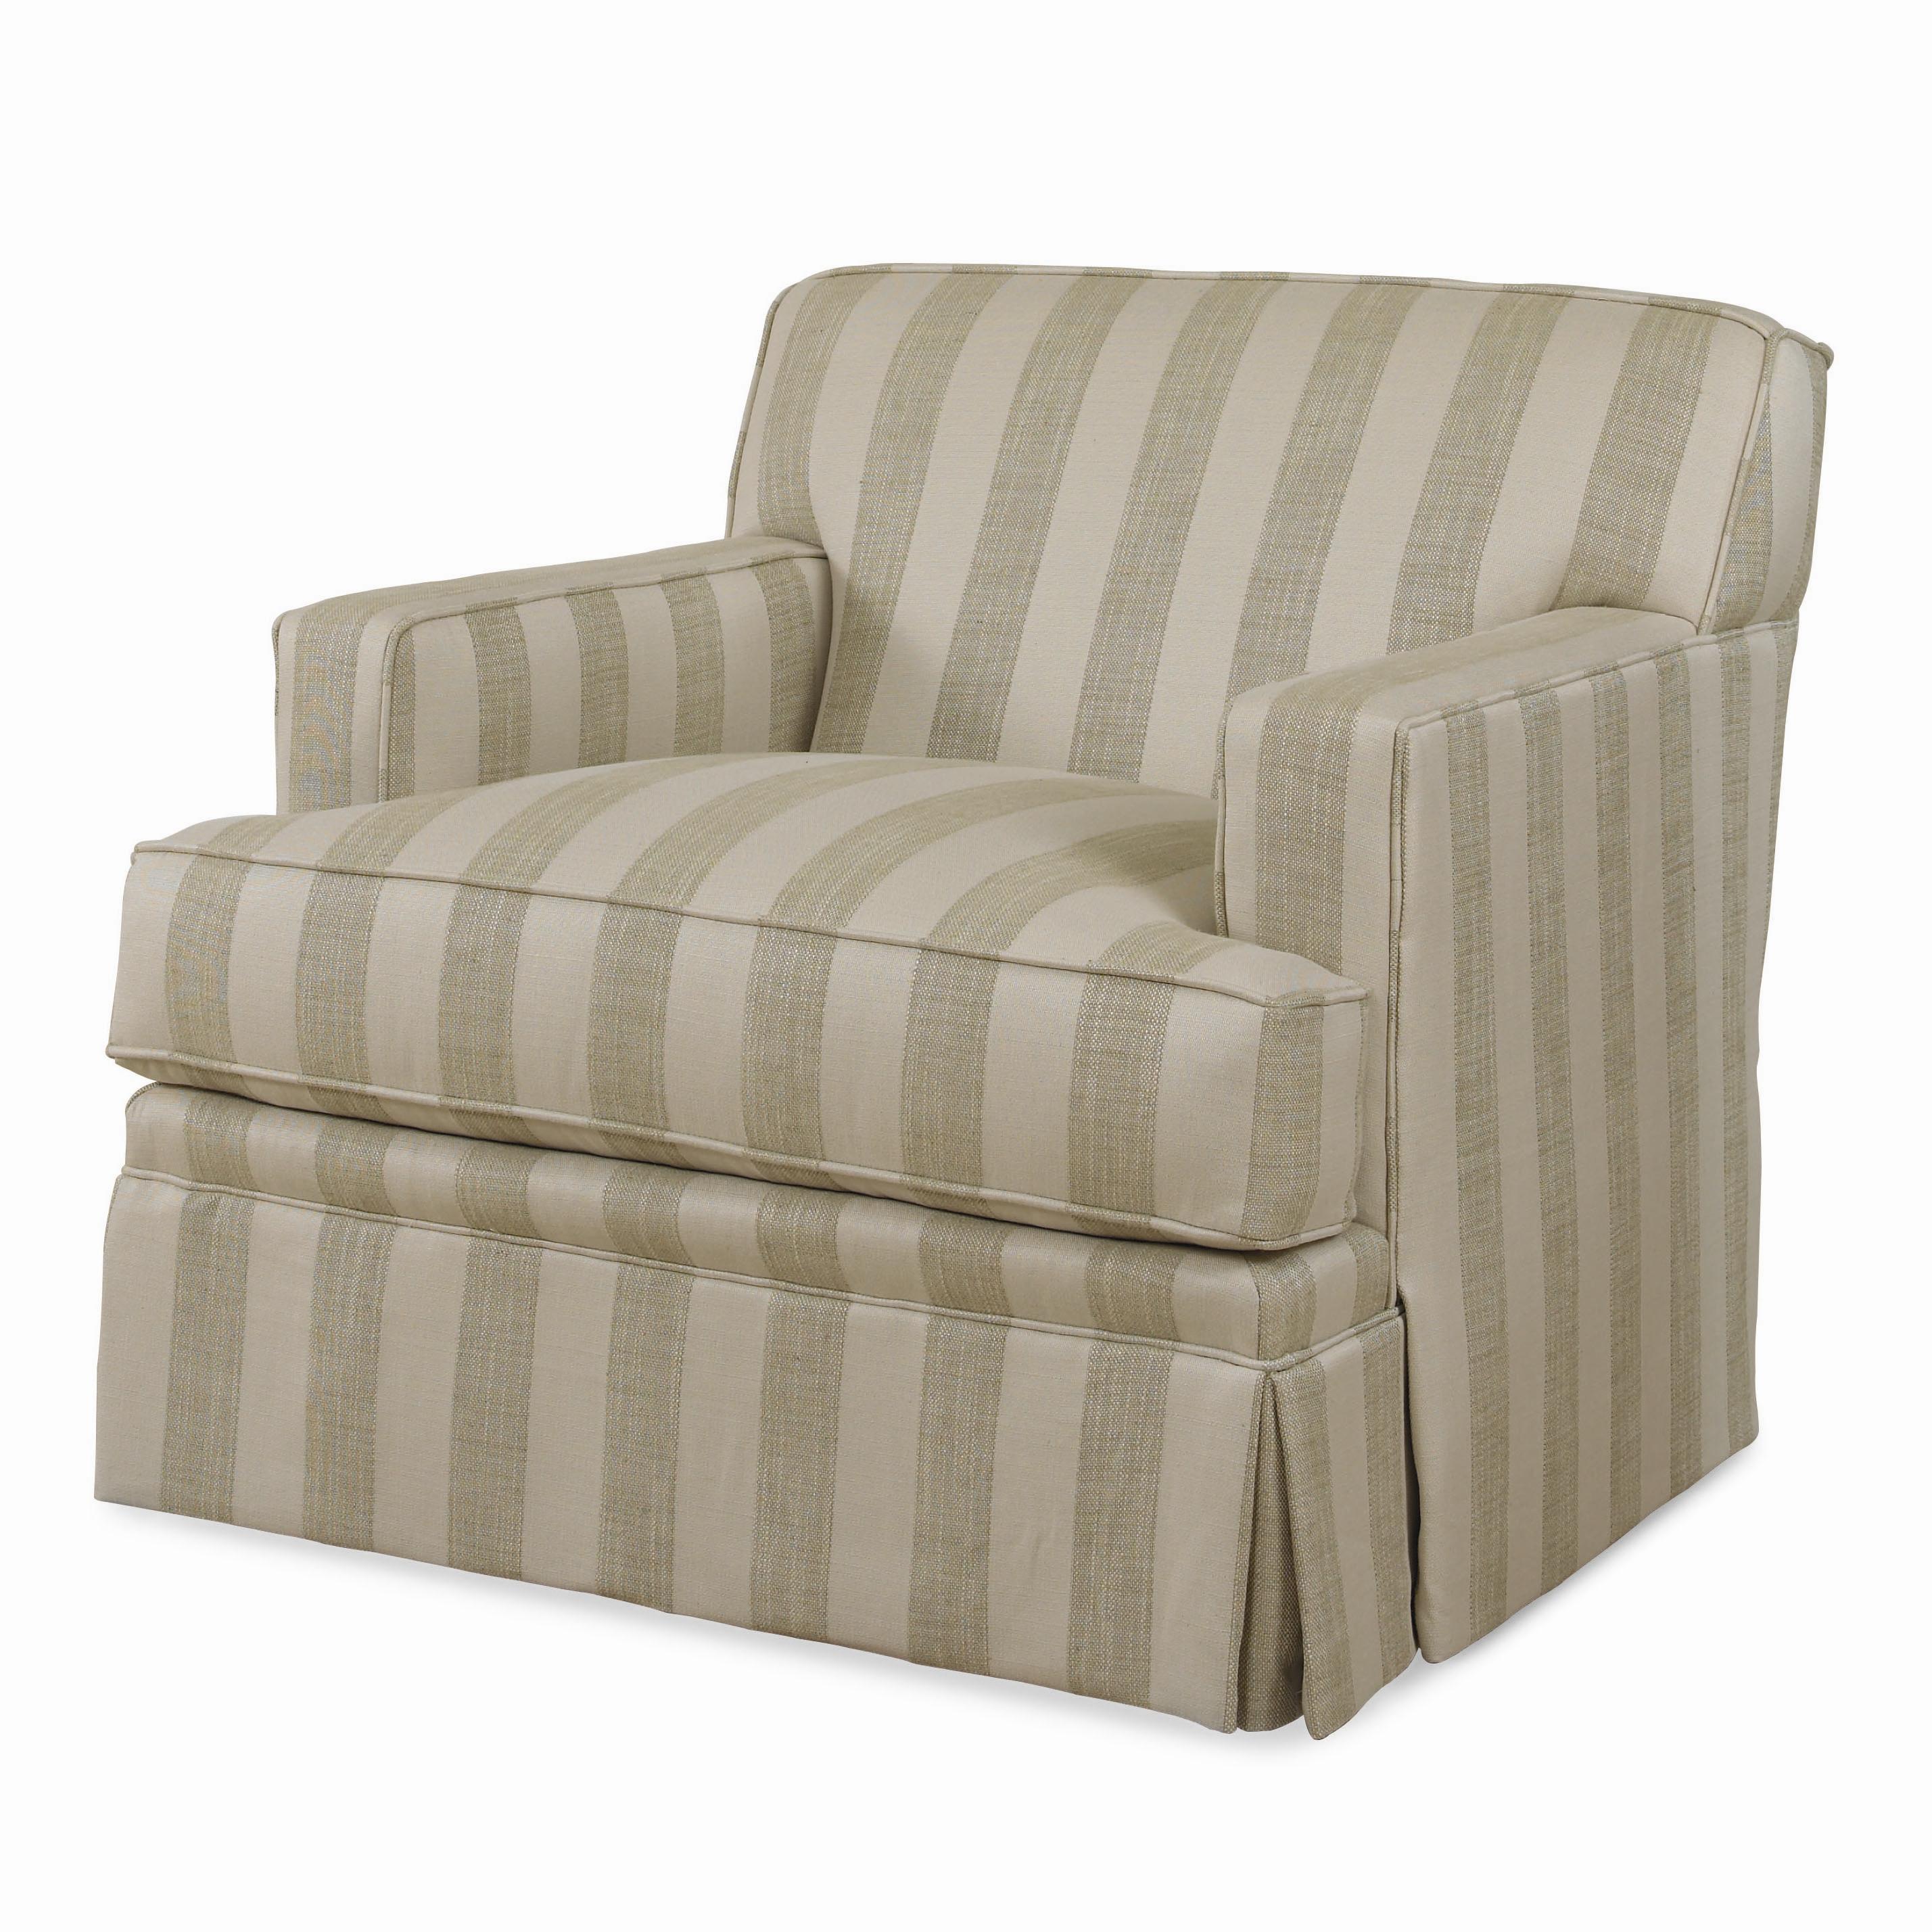 Incroyable Century Cornerstone U003cbu003eCustomizableu003c/bu003e Upholstered Chair With Track Arms  And Dressmaker Skirt   AHFA   Upholstered Chair Dealer Locator